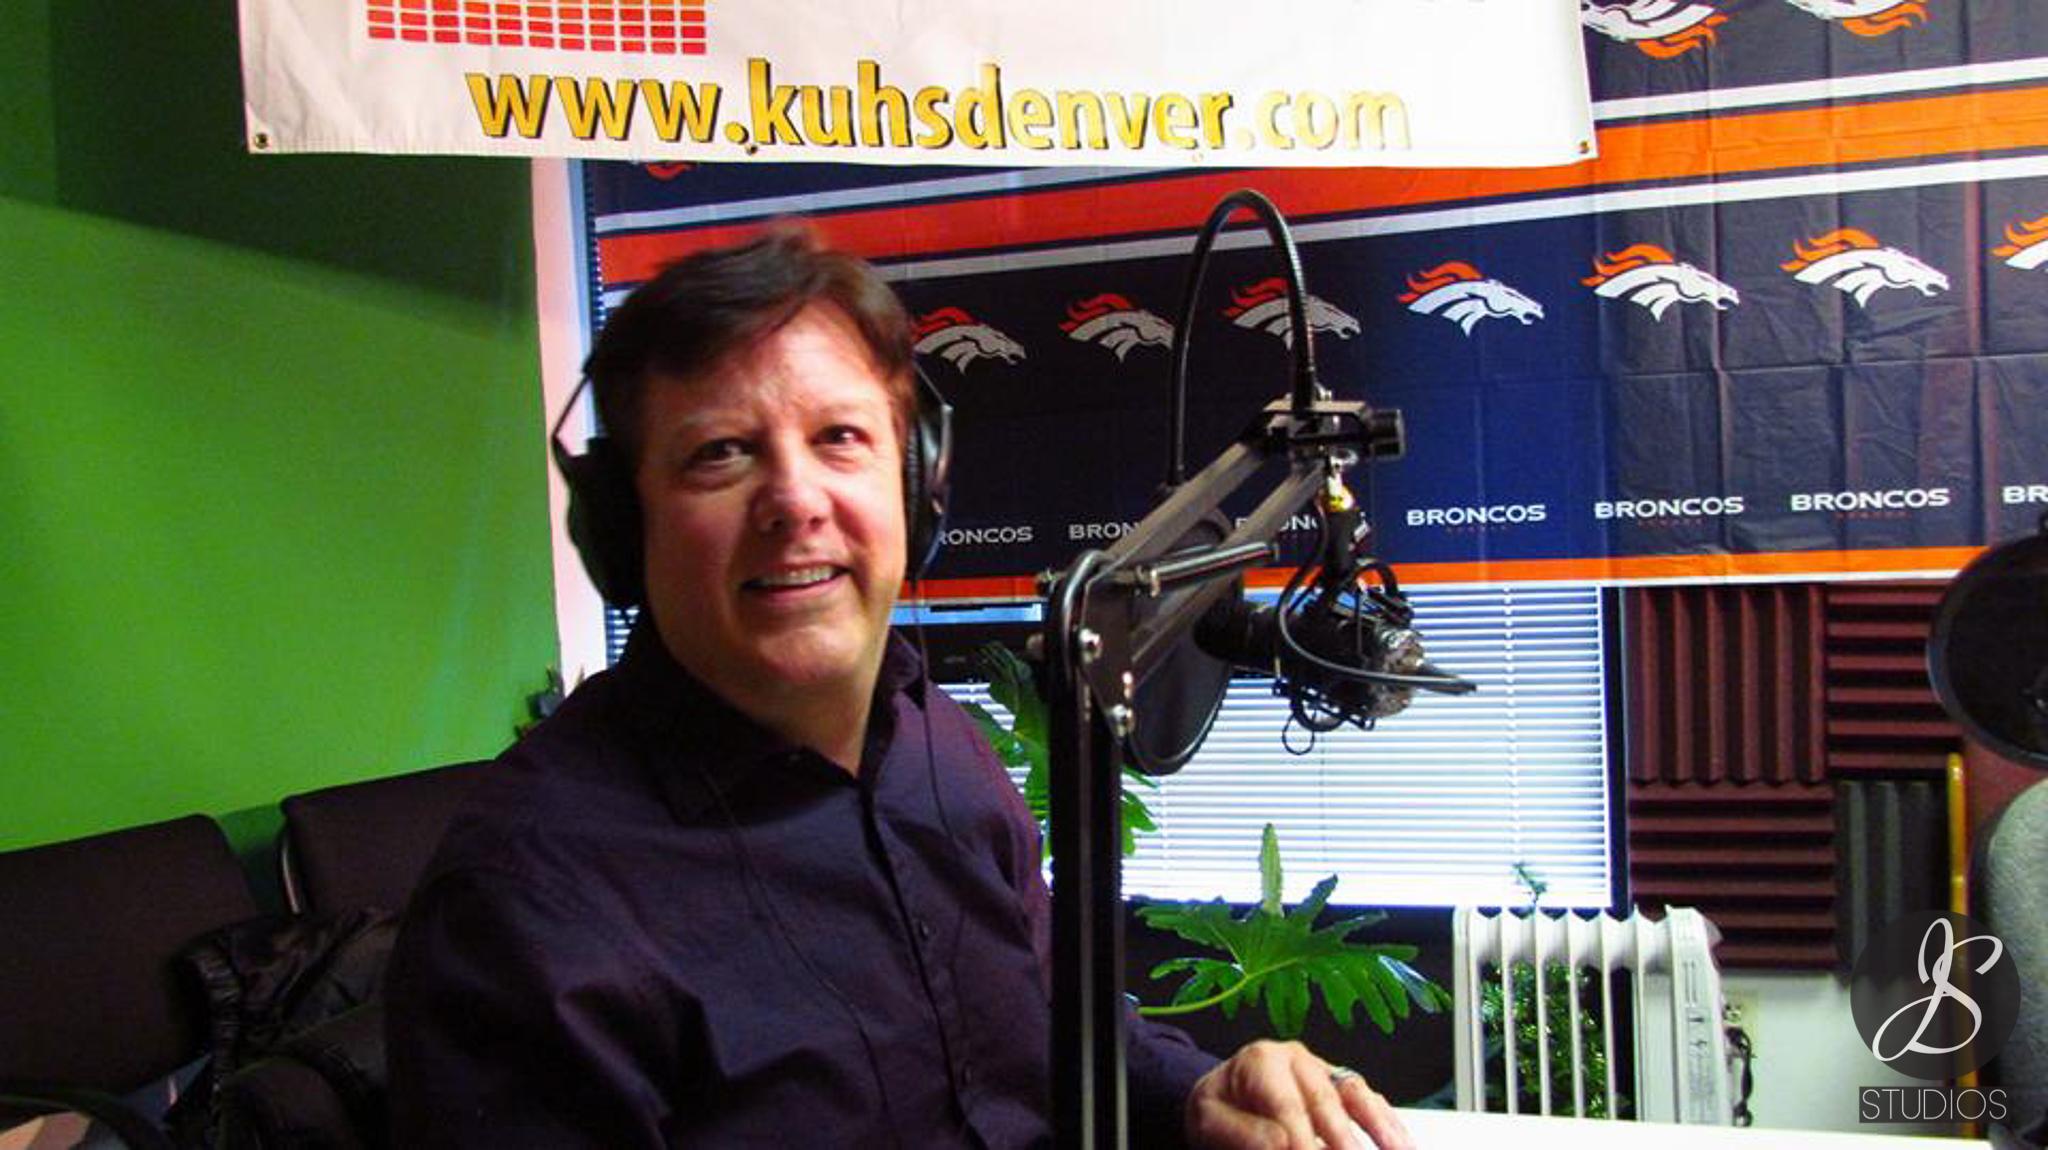 KUHS Denver The Author Show Tom Tolman-8.jpg